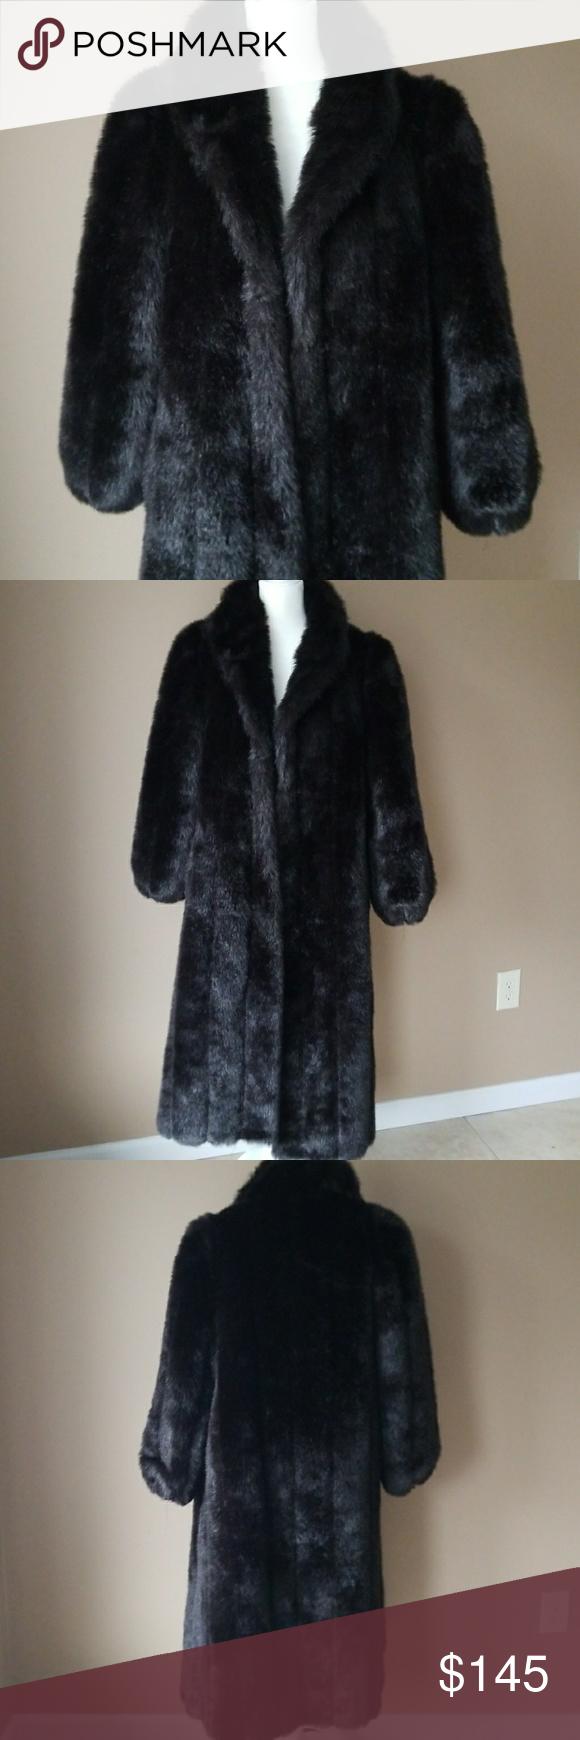 cc0d6ed9e Full Length Faux Fur Coat Luxurious black faux fur coat made in USA from  American Signature